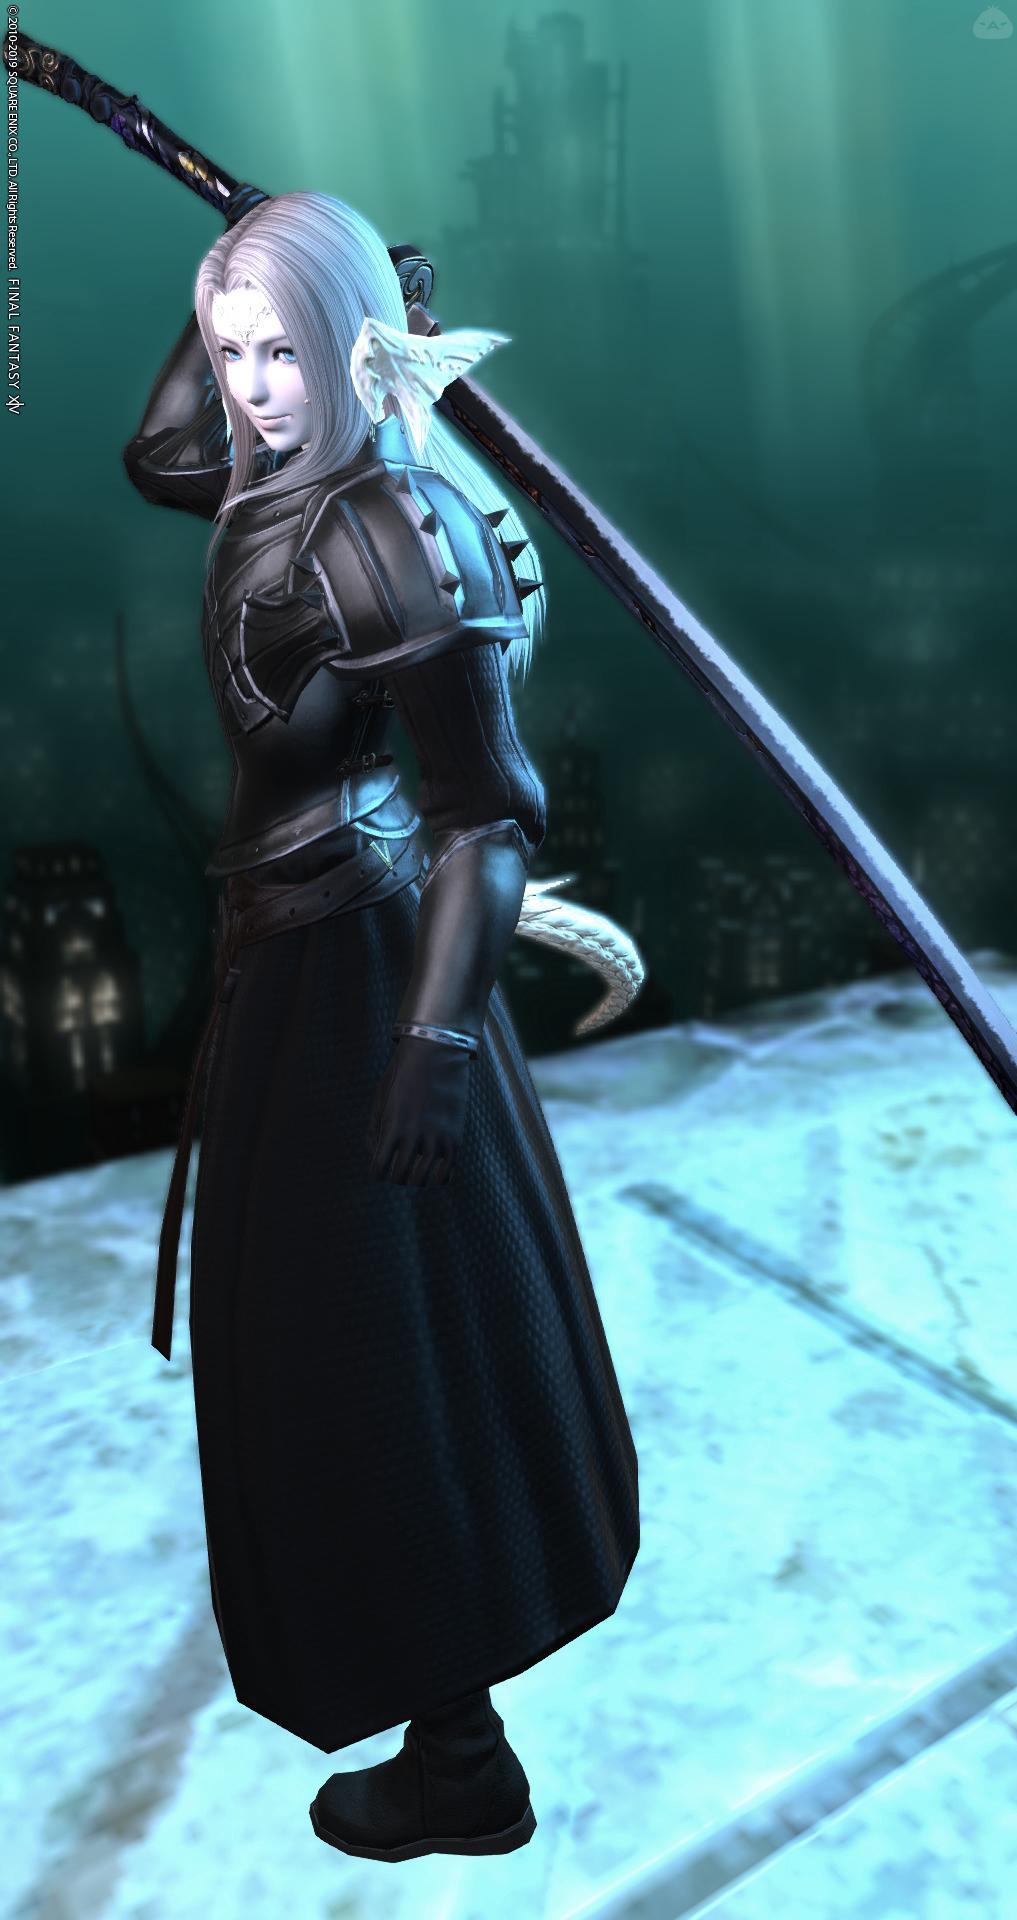 FF7 / セフィロス風(暗黒騎士)